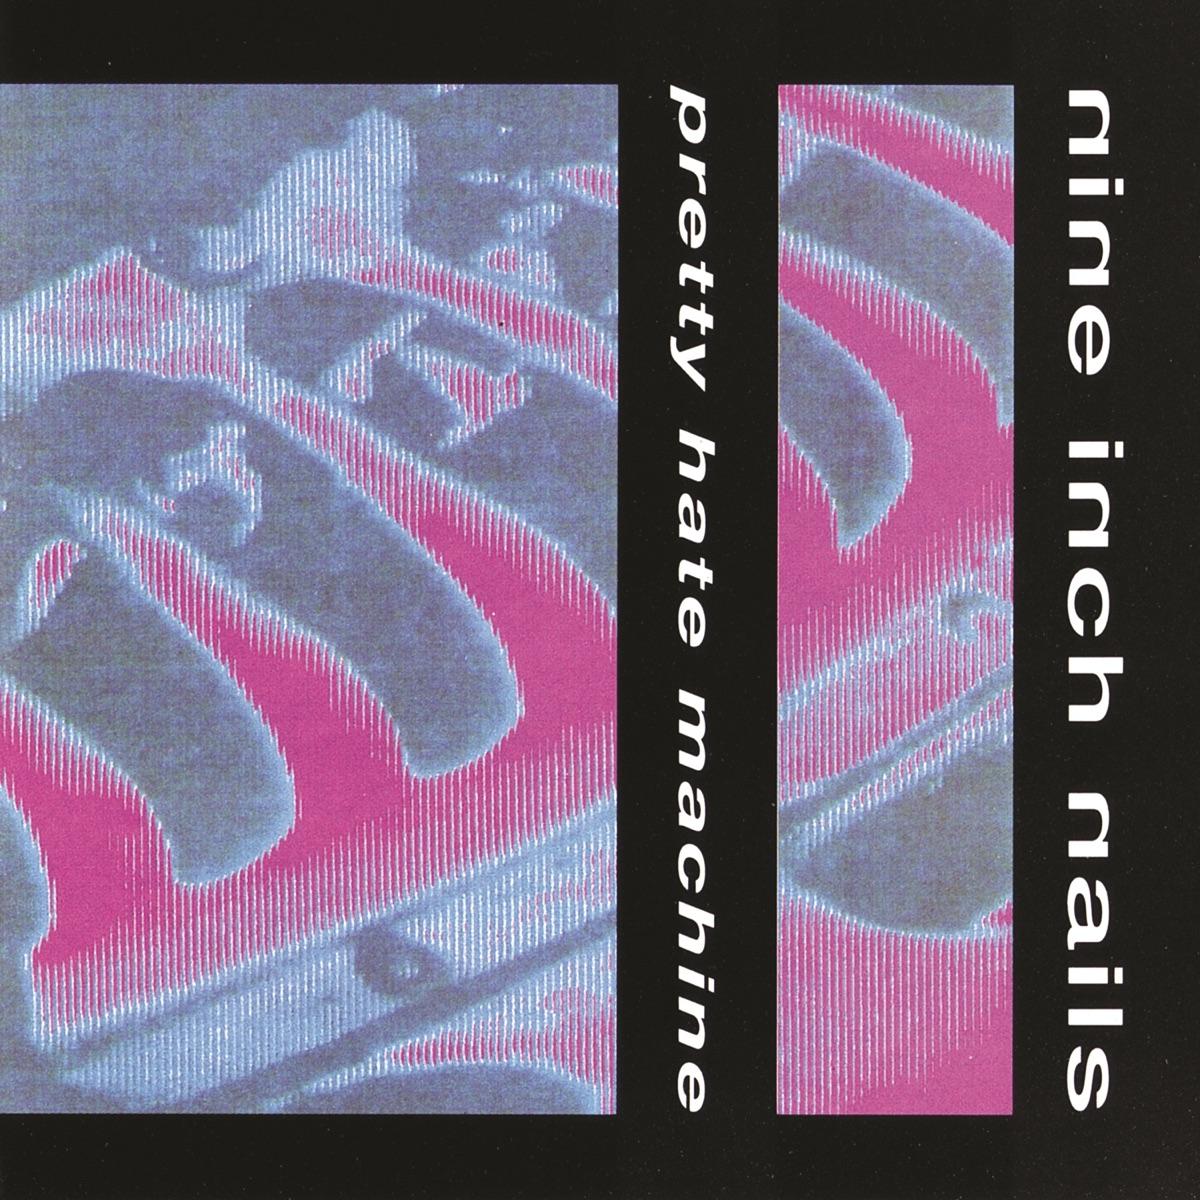 Nine Inch Nails - Pretty Hate Machine: tres décadas de destrucción masiva |  Science of Noise - Rock Magazine